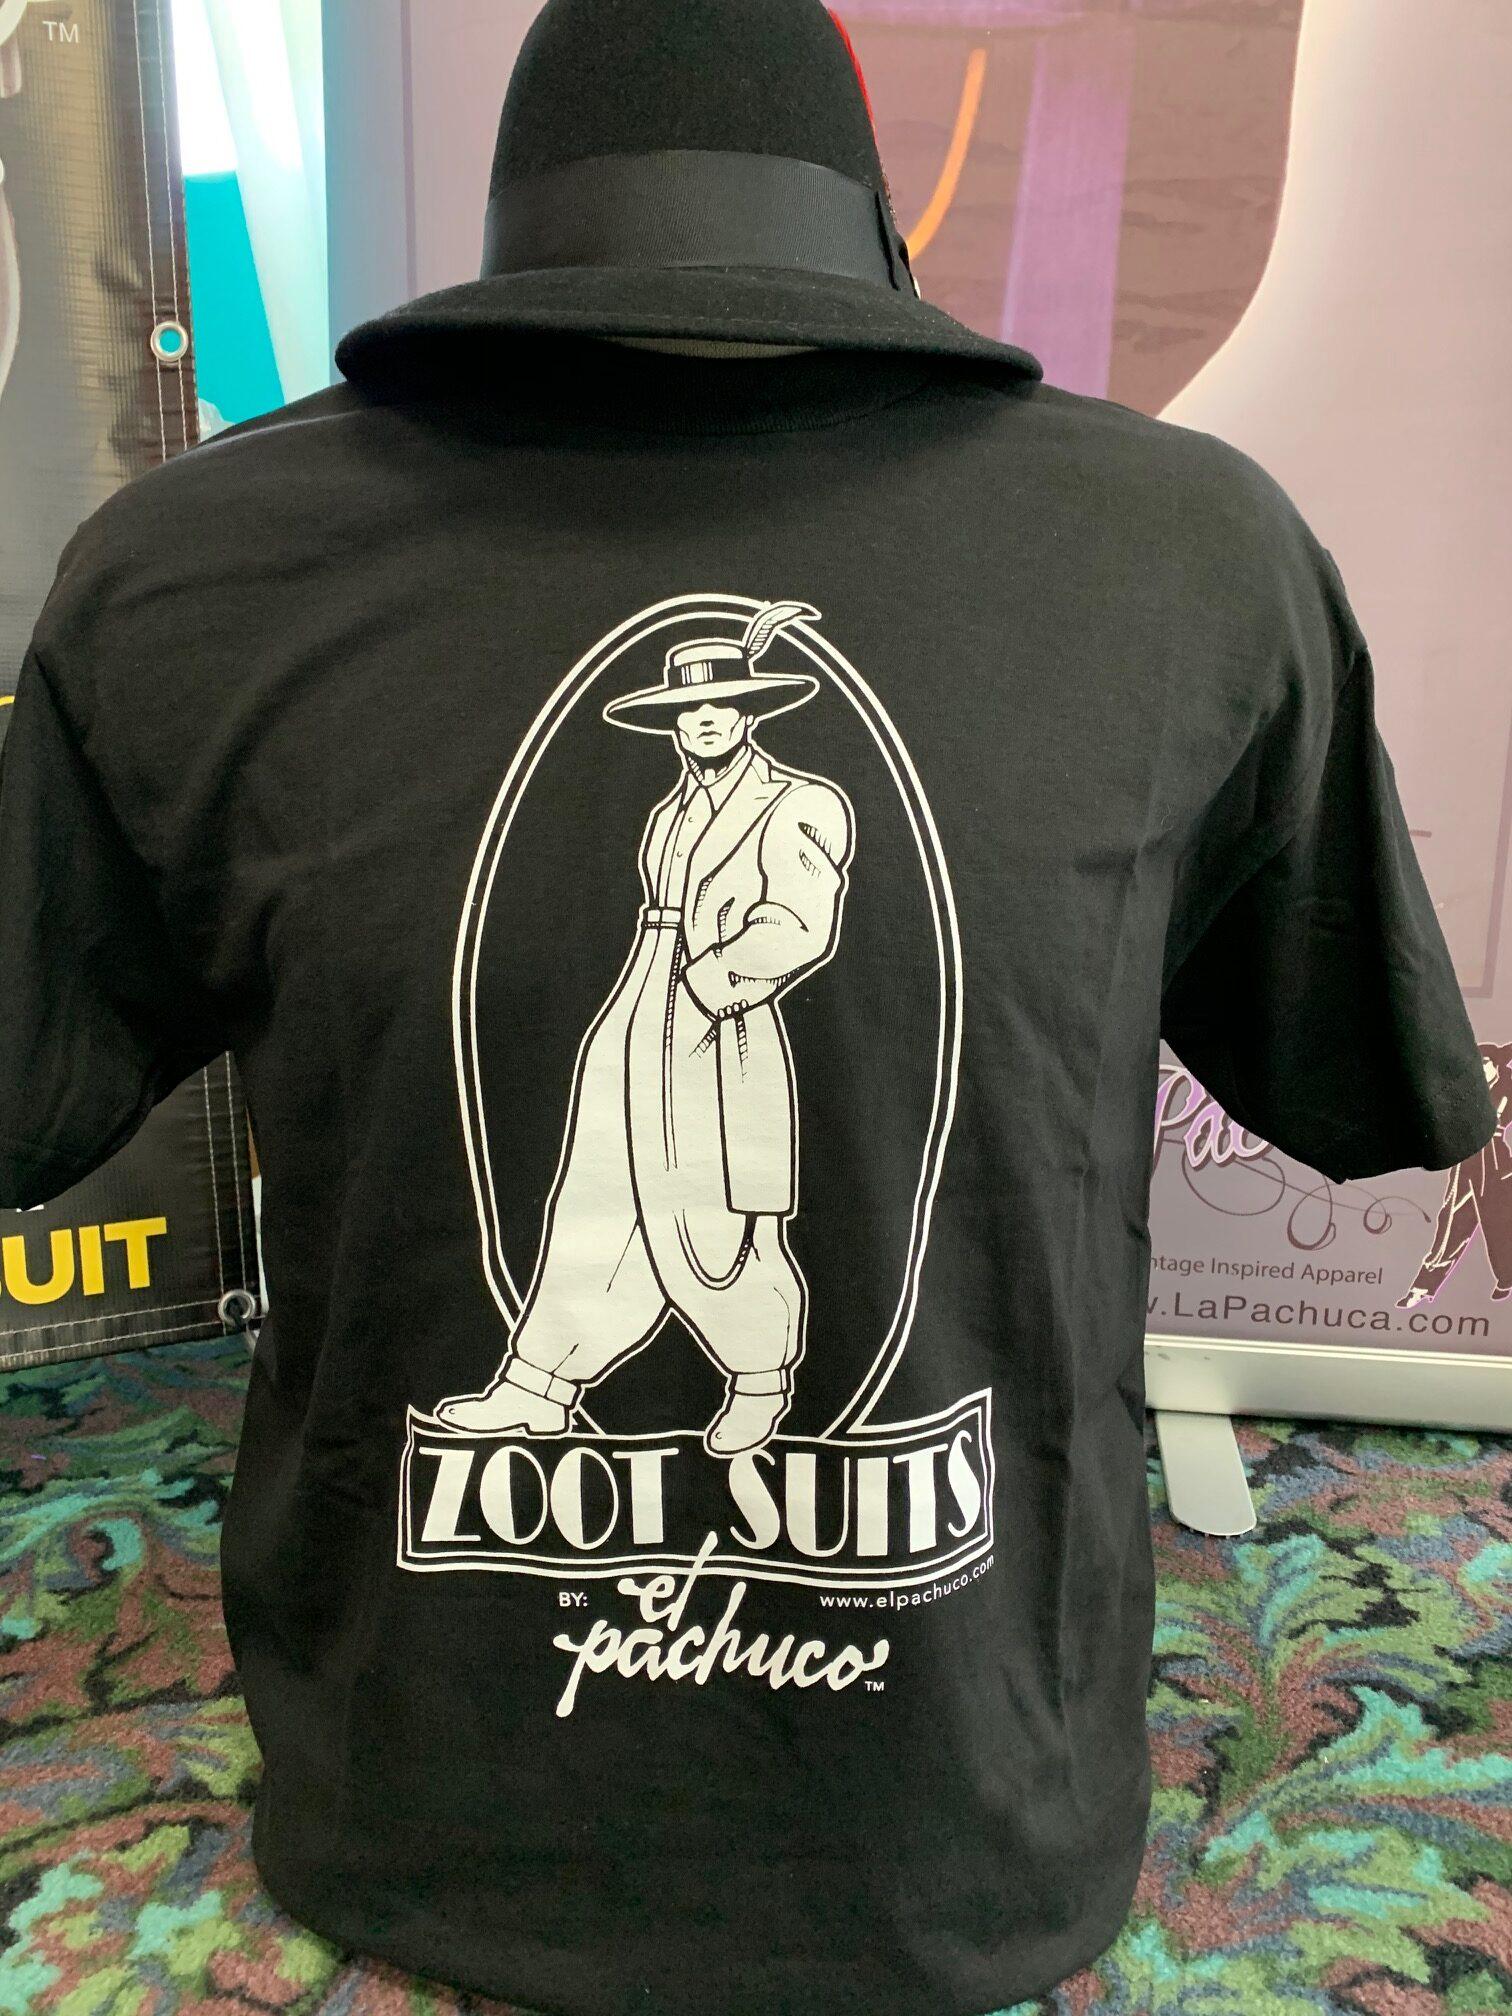 Pachuco T-Shirt